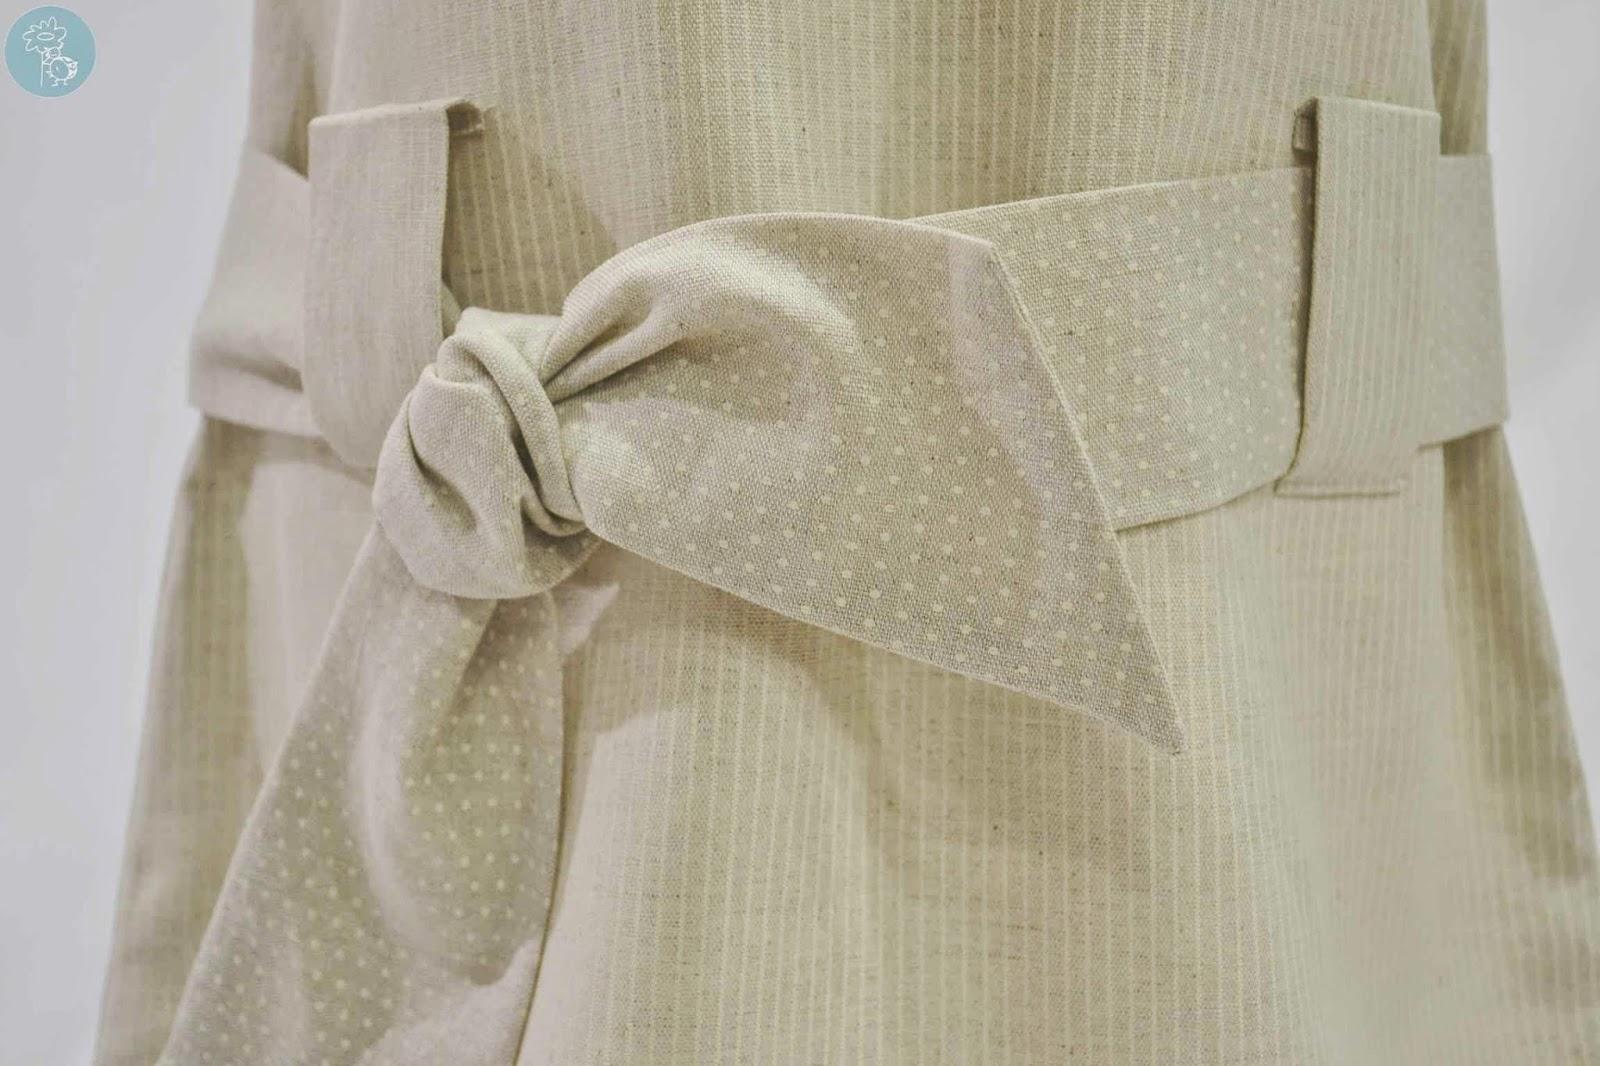 Detalle cinturón vestido Babiné en Tienda -Blog- Retamalmodainfantil